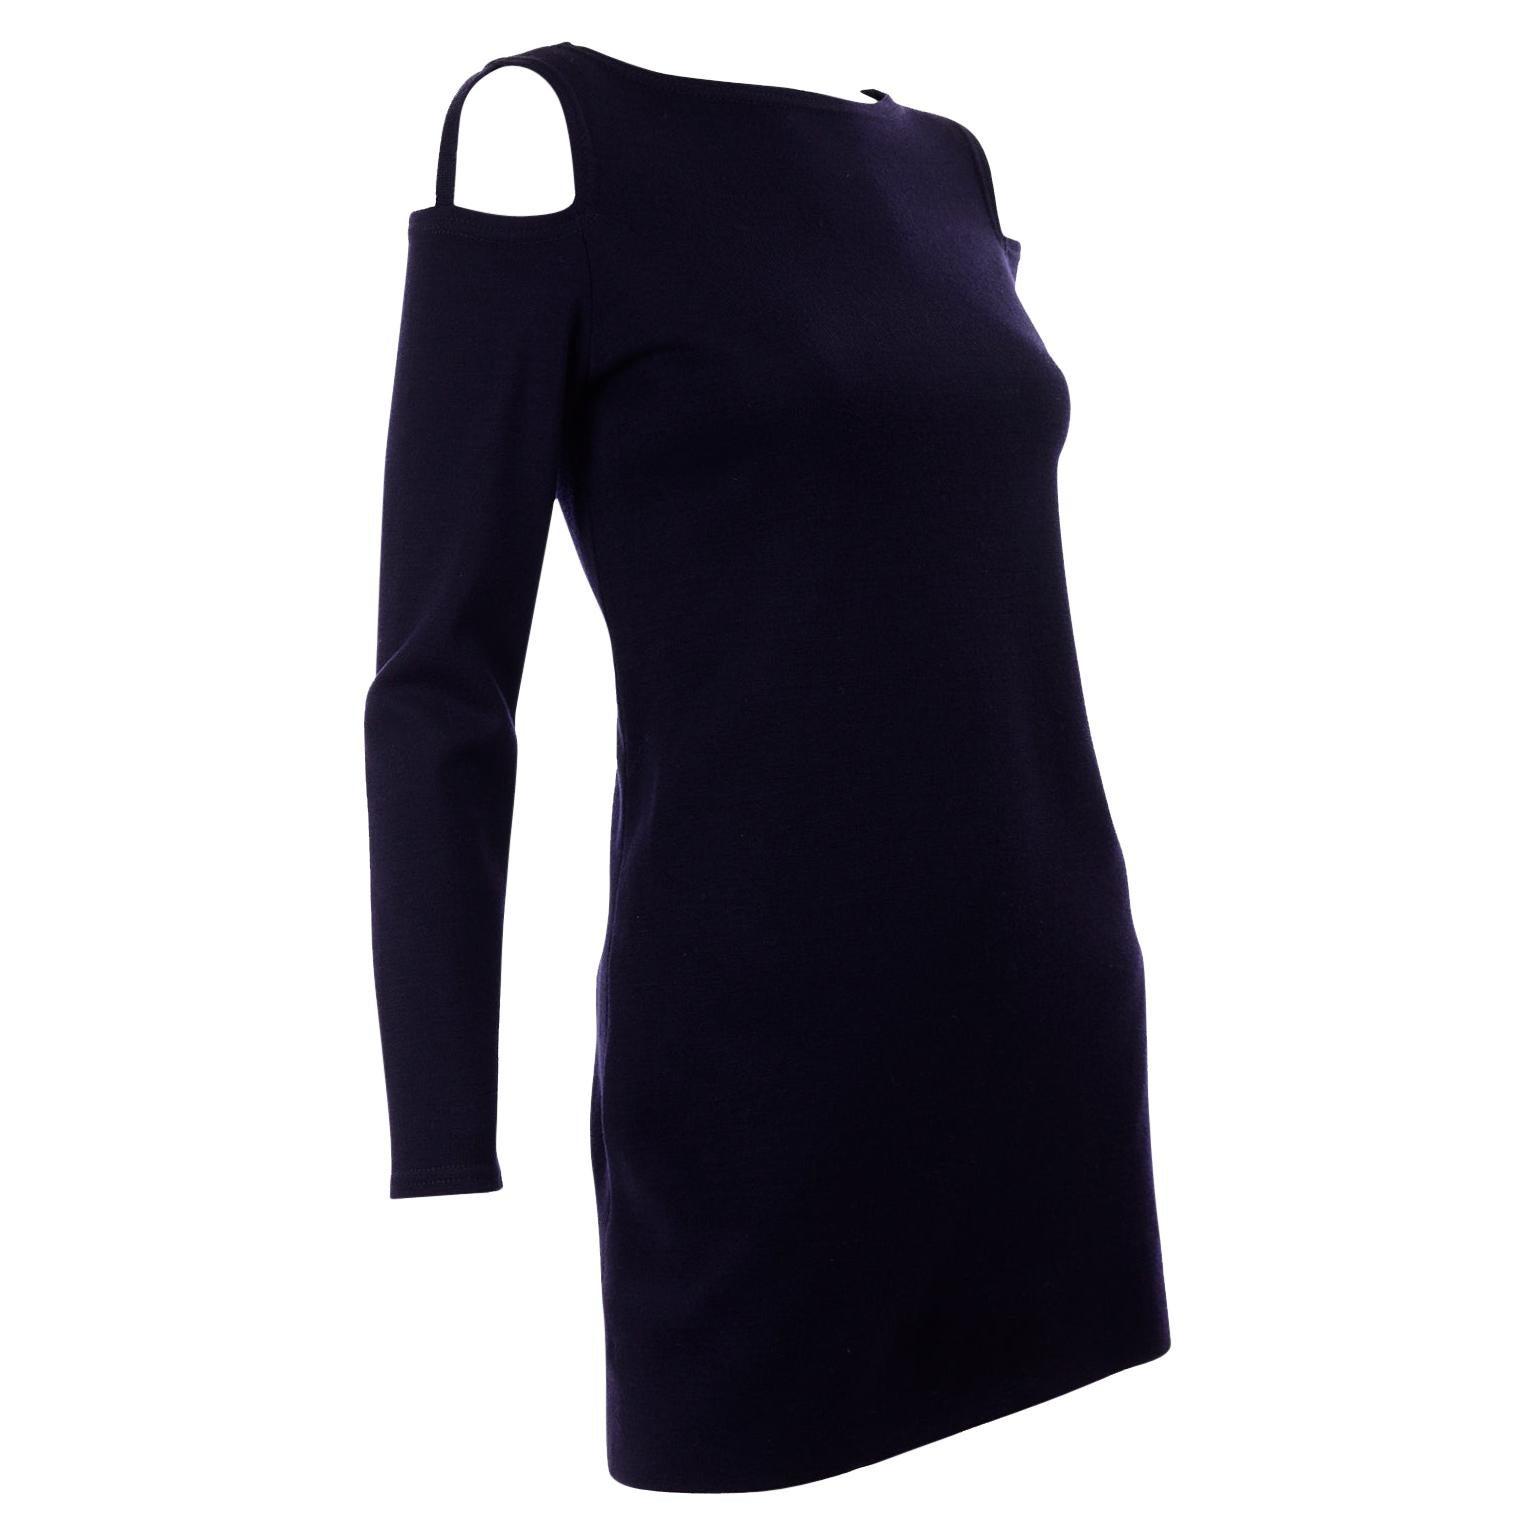 1960s Rudi Gernreich Navy Blue Wool Knit Vintage Dress With Cutout Shoulders